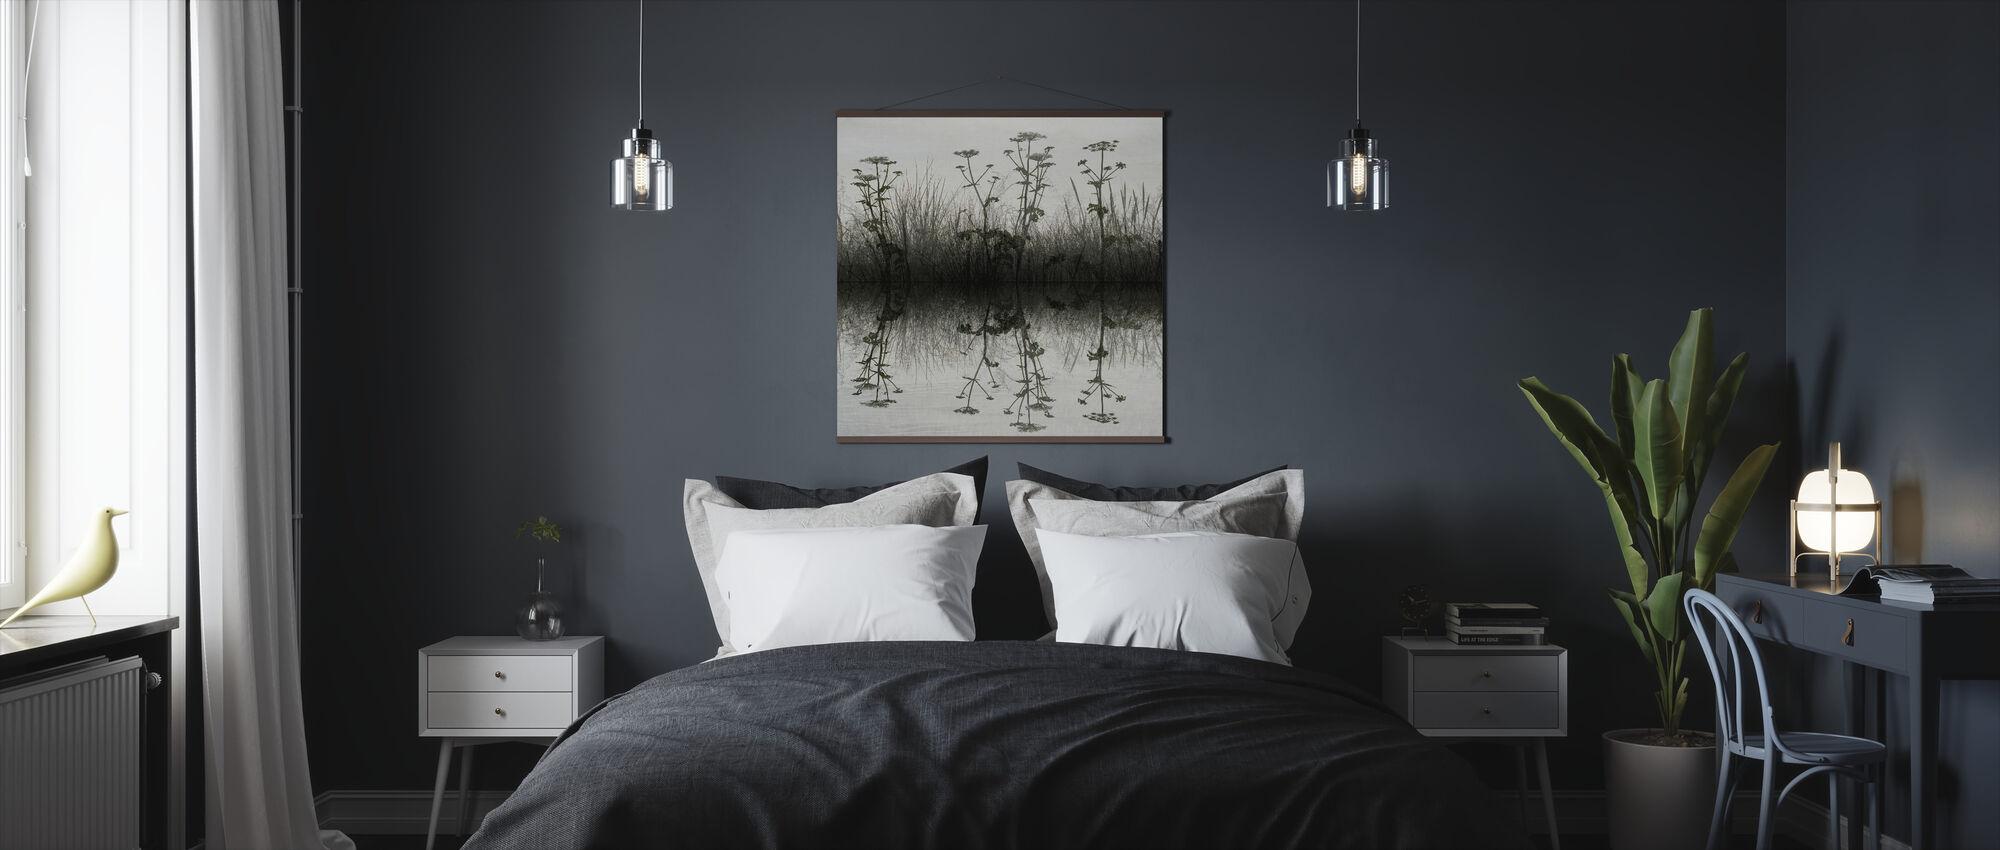 Floral Water Reflectie - Poster - Slaapkamer